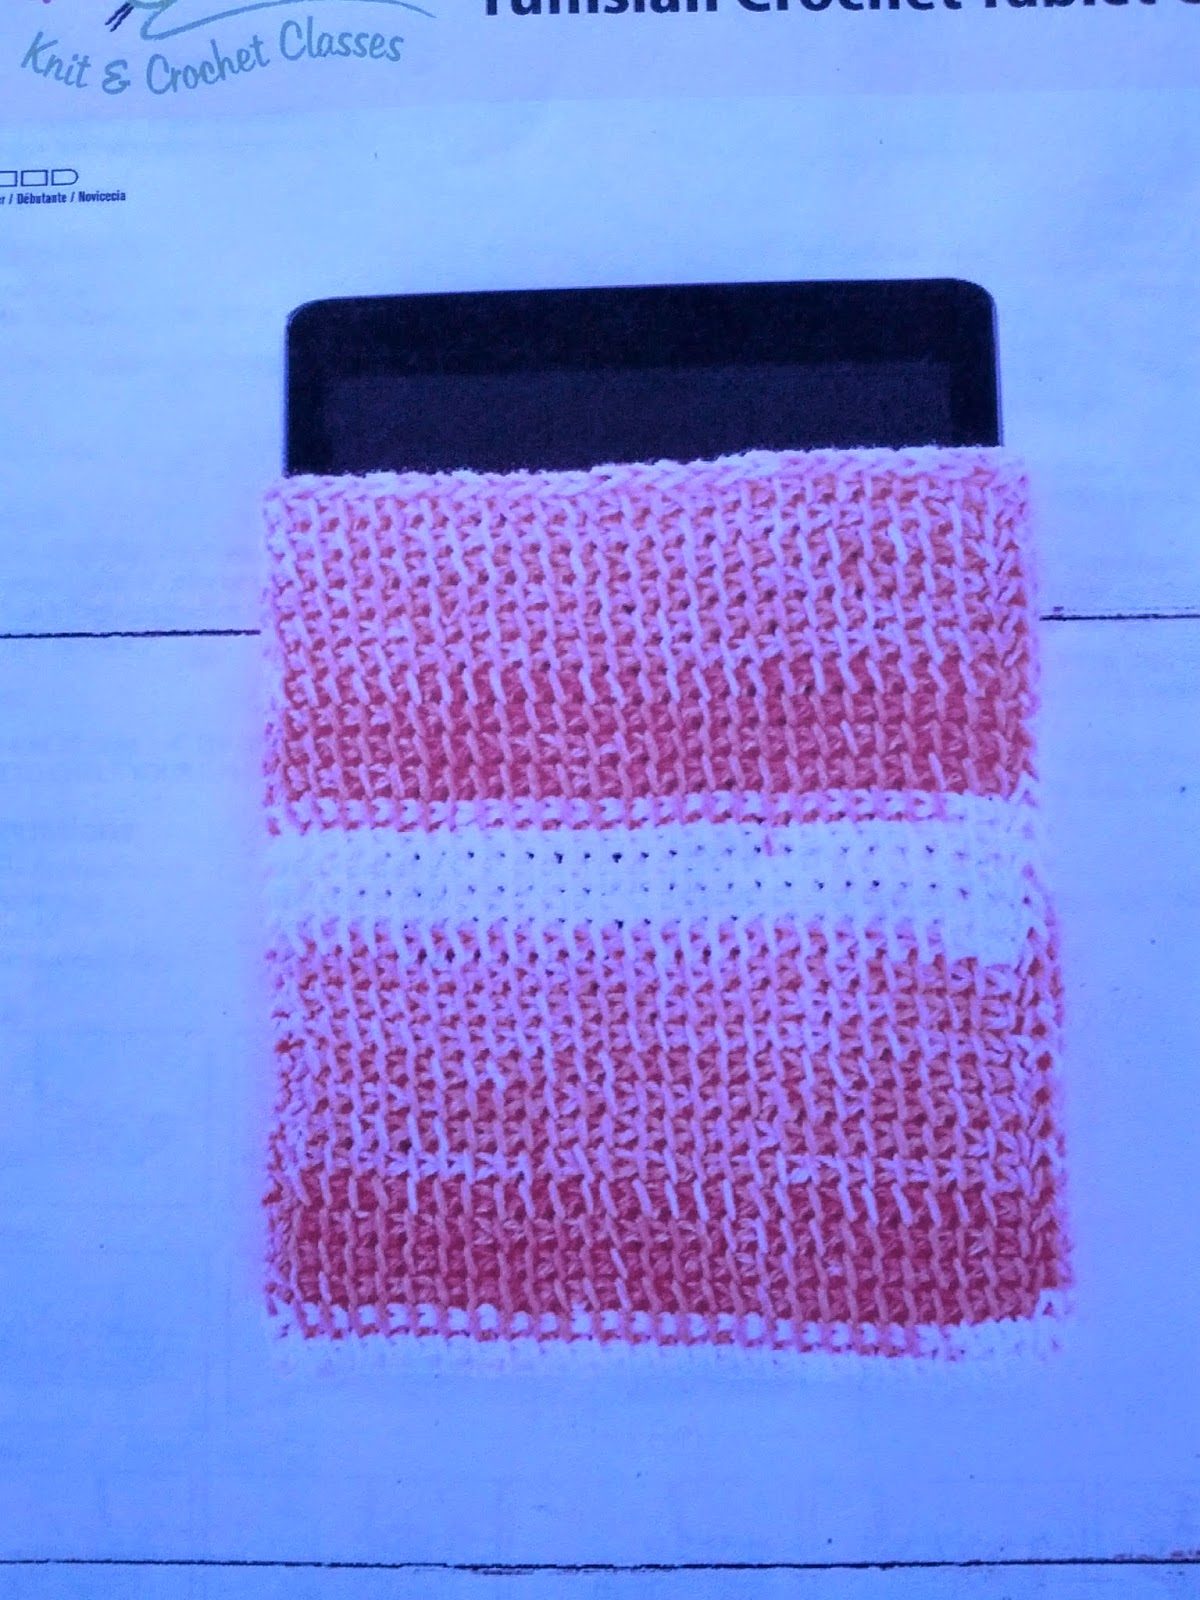 Tunisian Crochet Tablet Cover